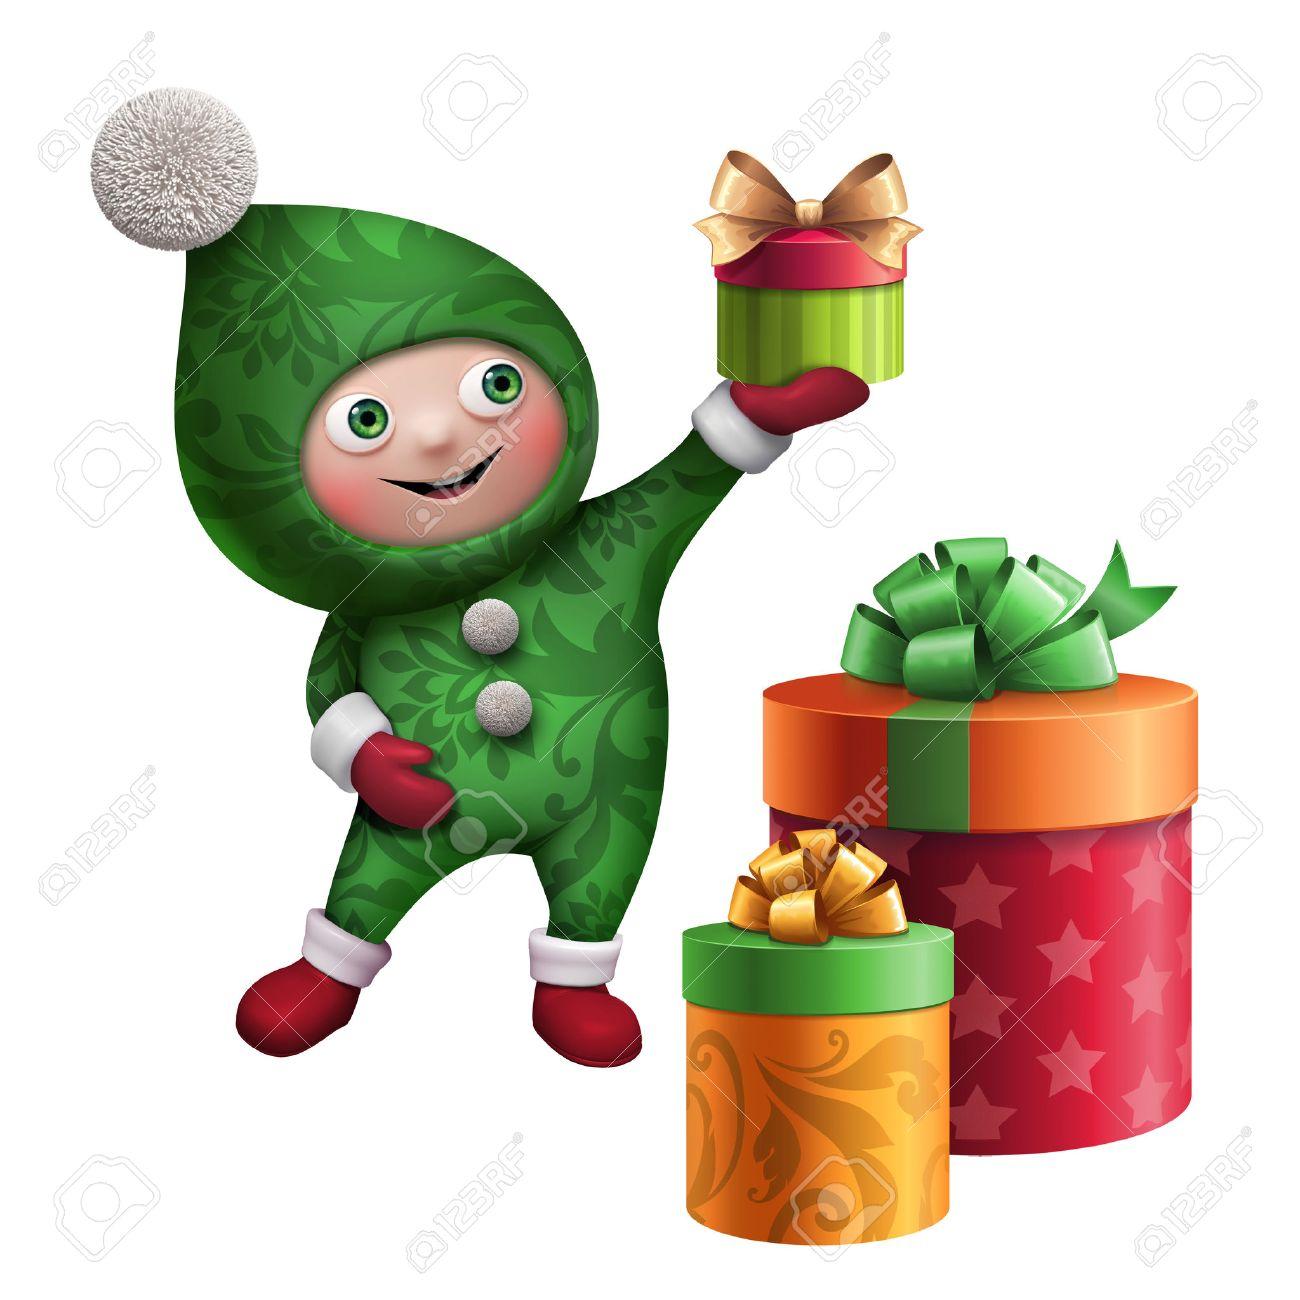 Cute Funny Christmas Elf Cartoon Holding Gift Clip Art Stock Photo ...